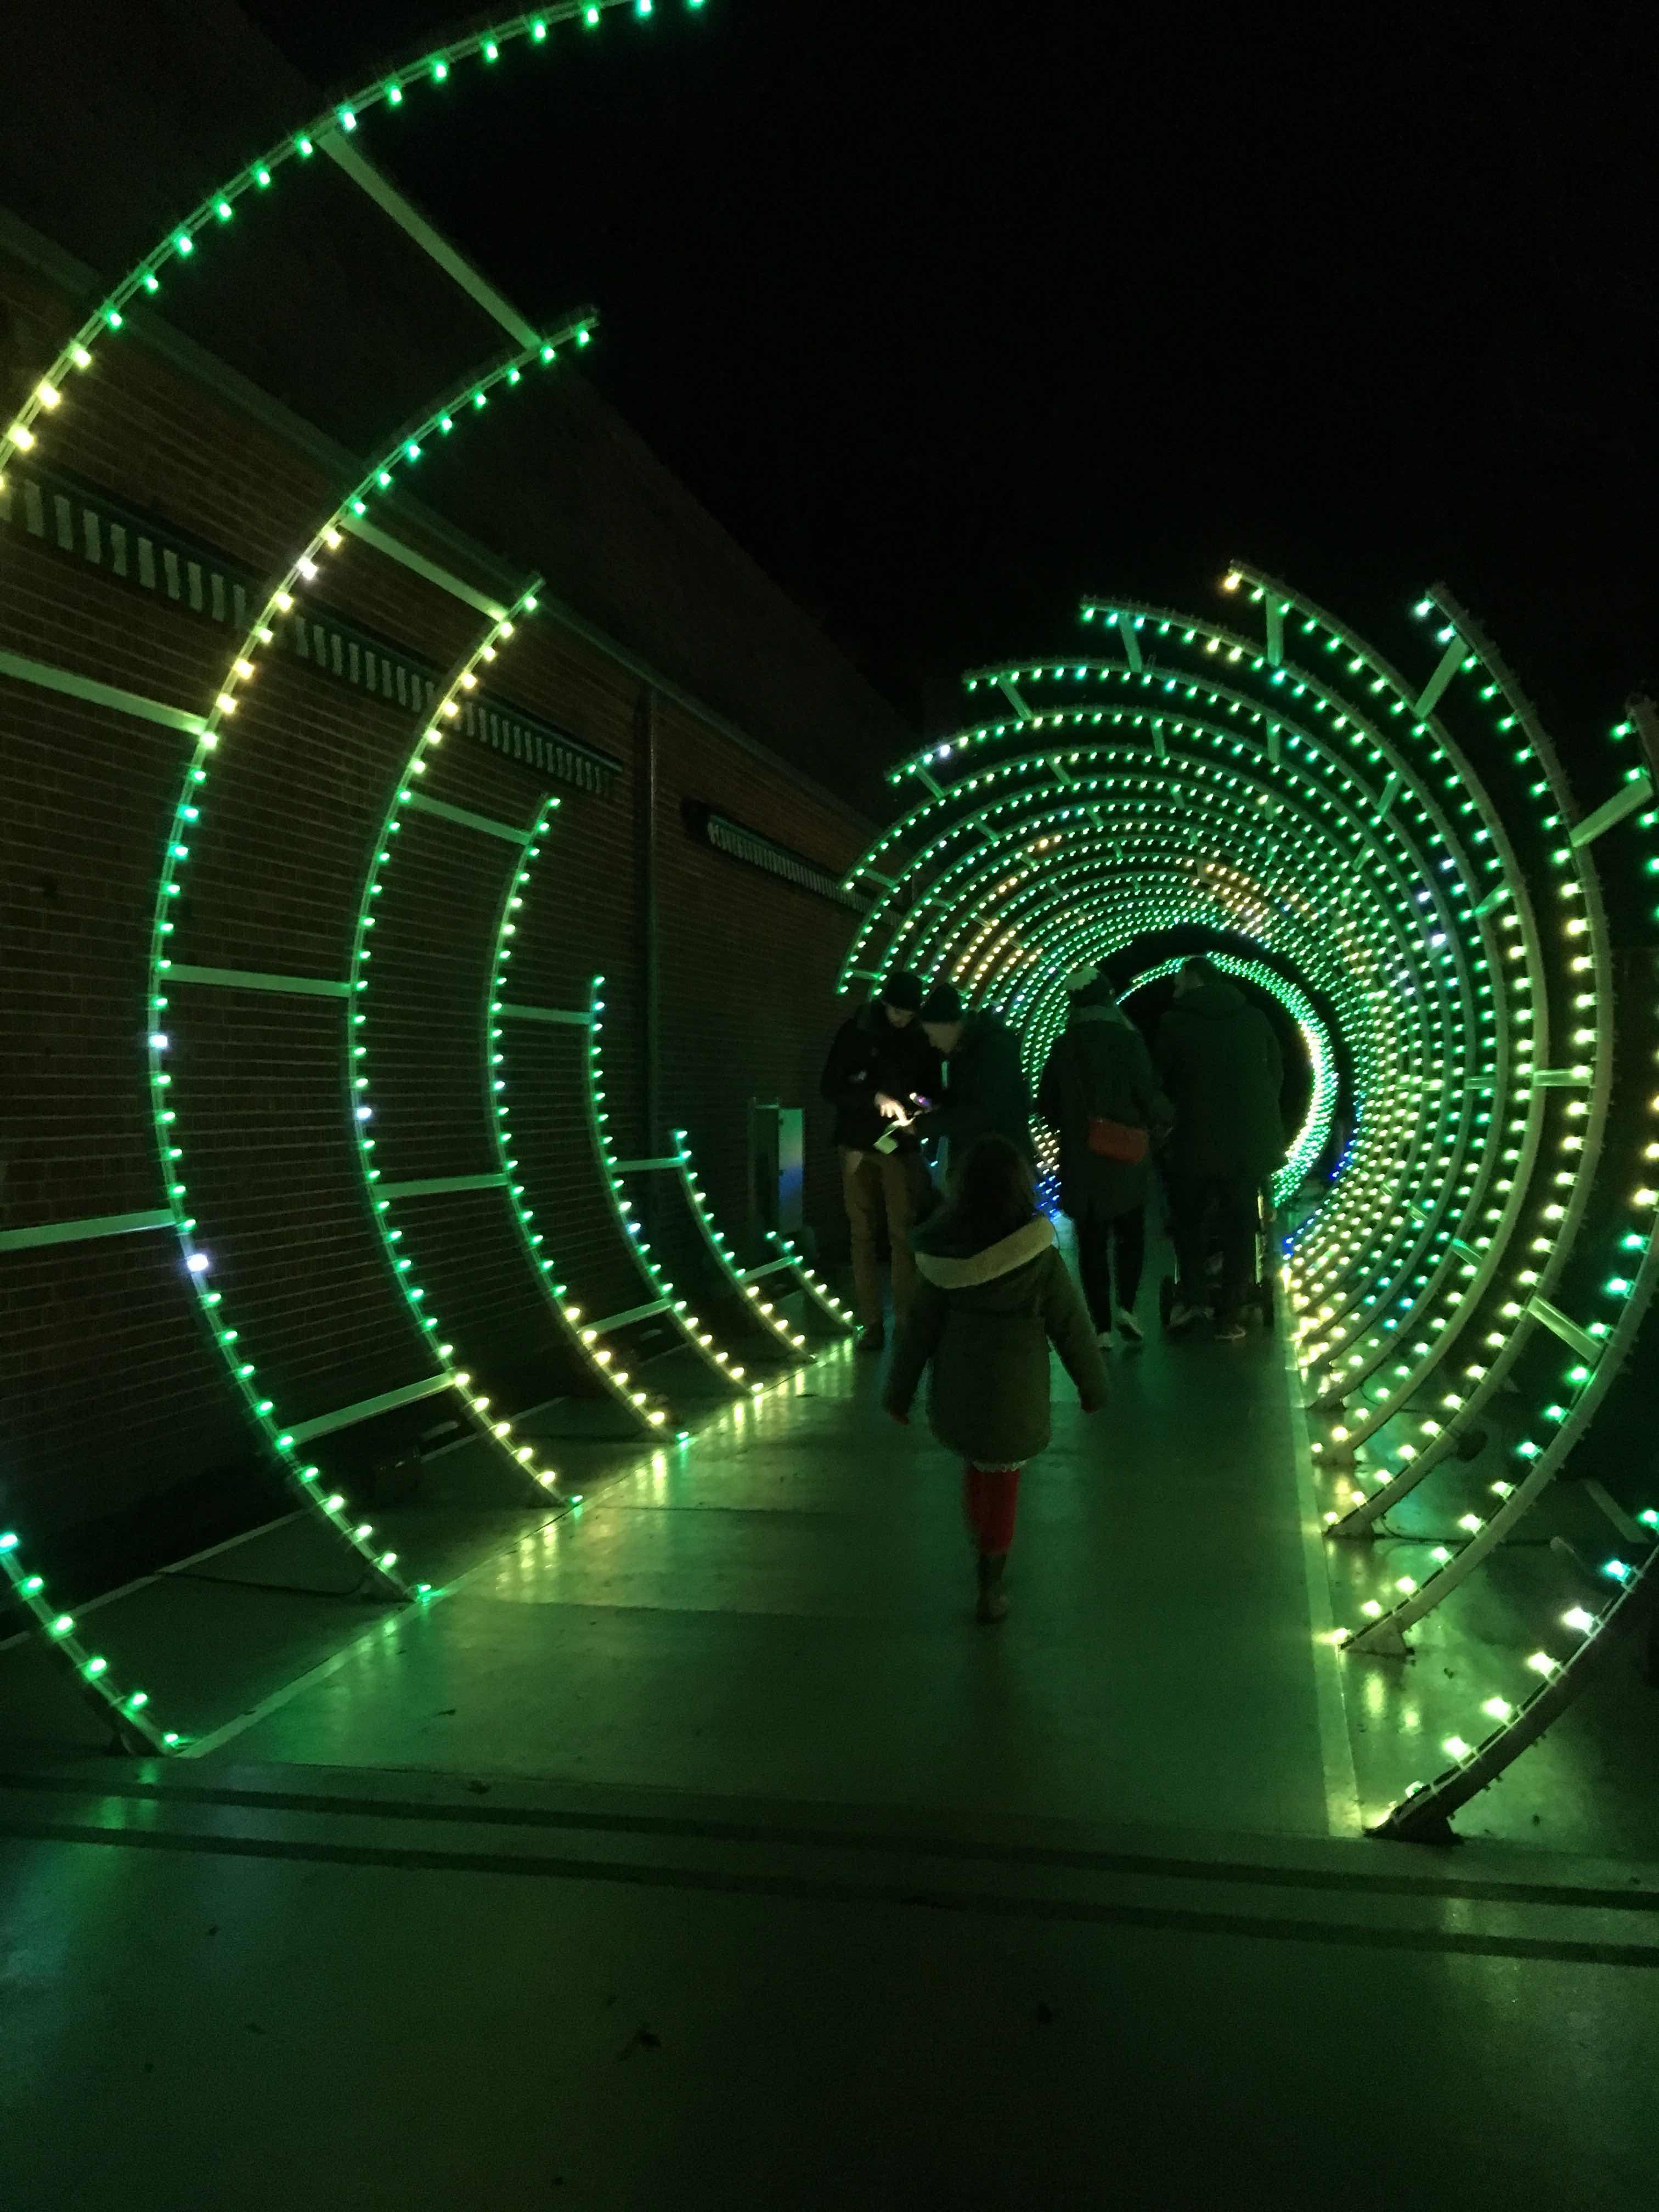 Tunnel of light at Waddesdon Manor